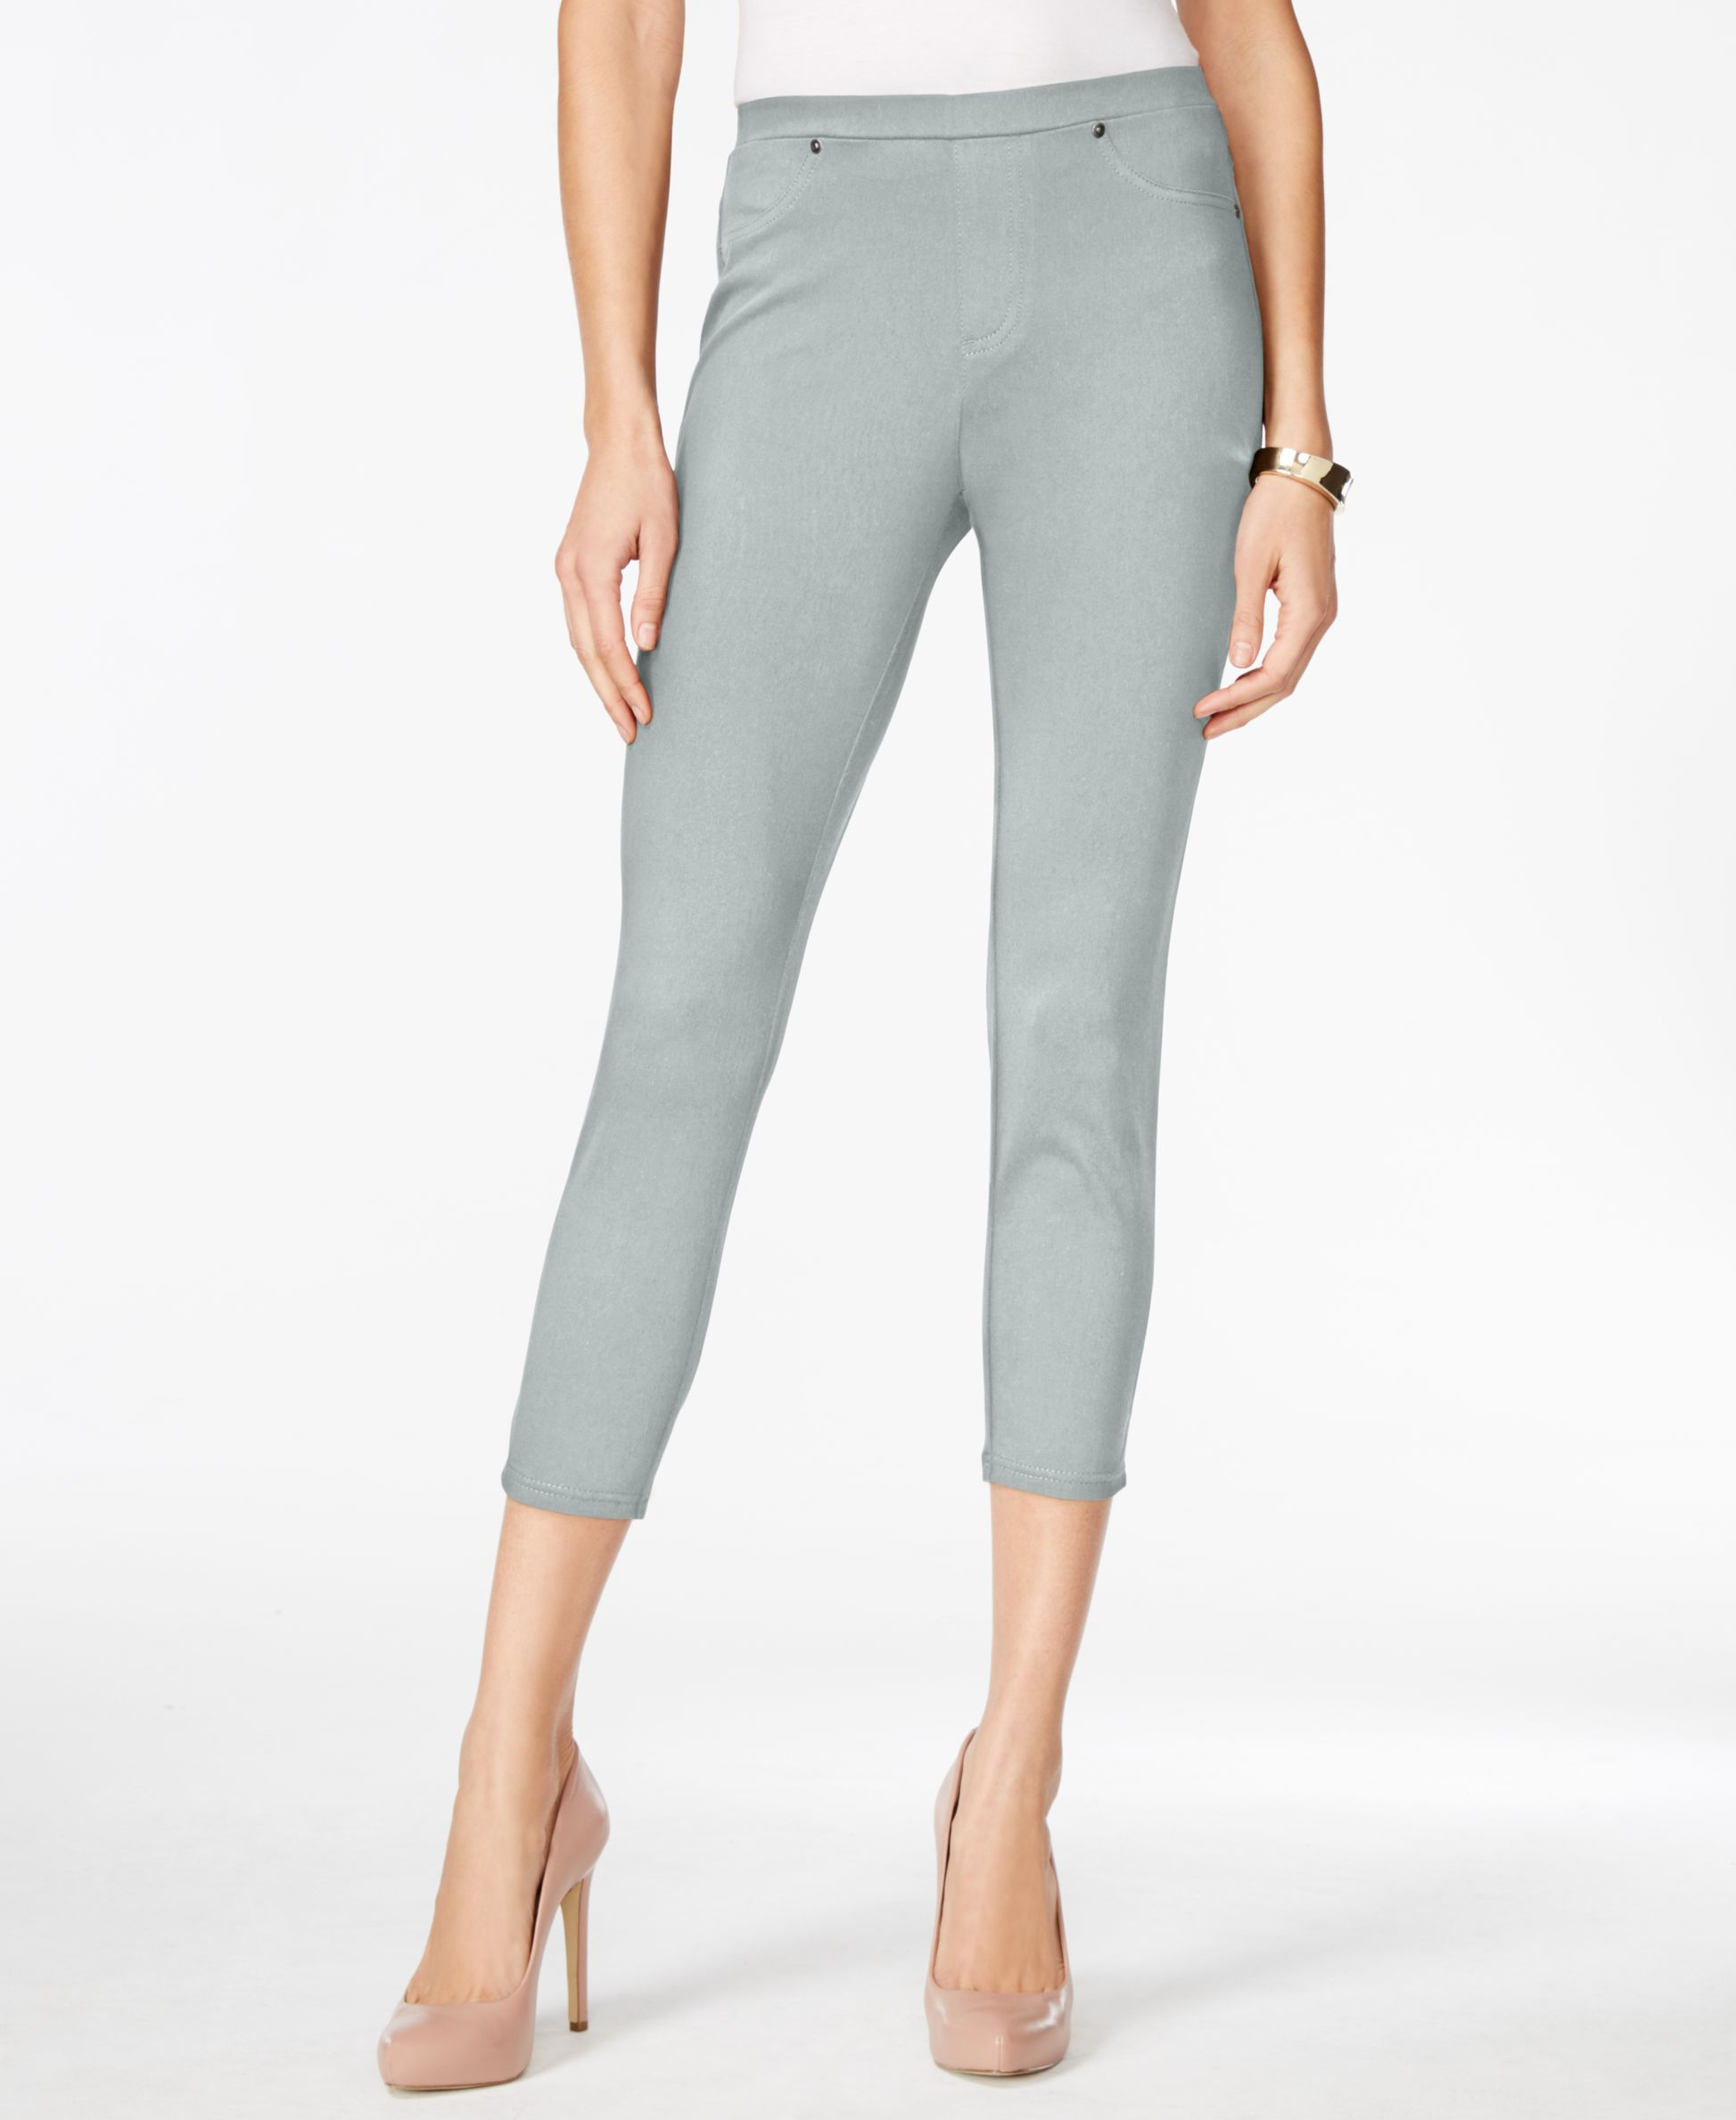 bedb3c2f13909 Twill Capri Leggings, Created for Macy's   Products   Capri leggings ...